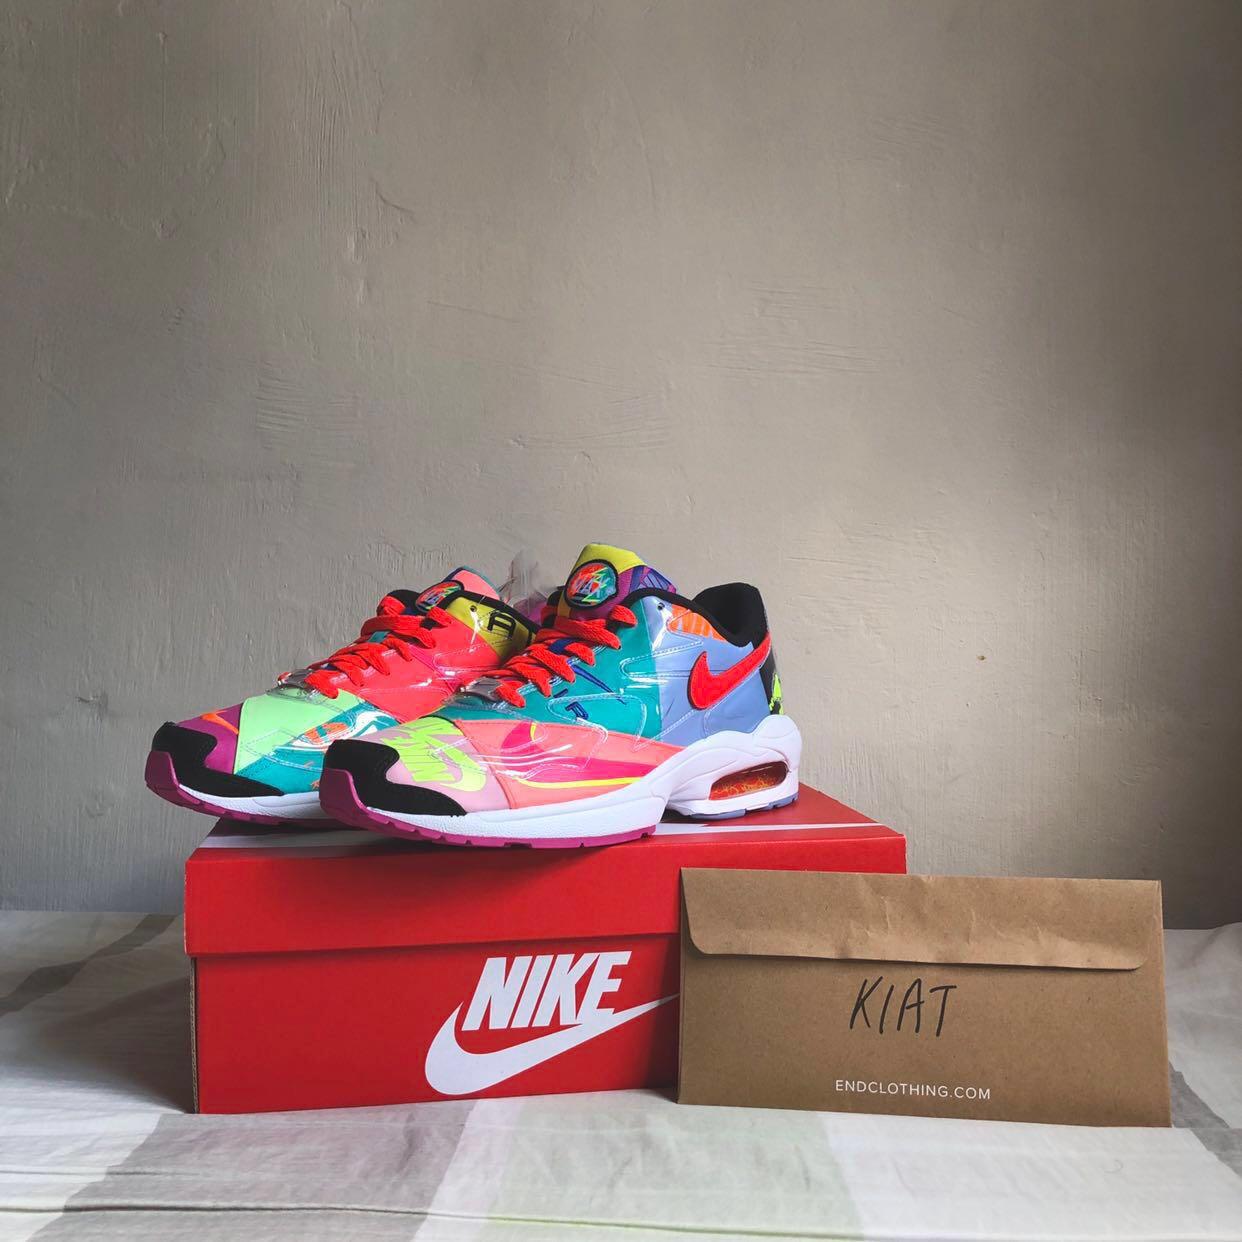 detailed look c7e49 88e6e Nike Air Max2 Light Atmos, Men s Fashion, Footwear, Sneakers on ...